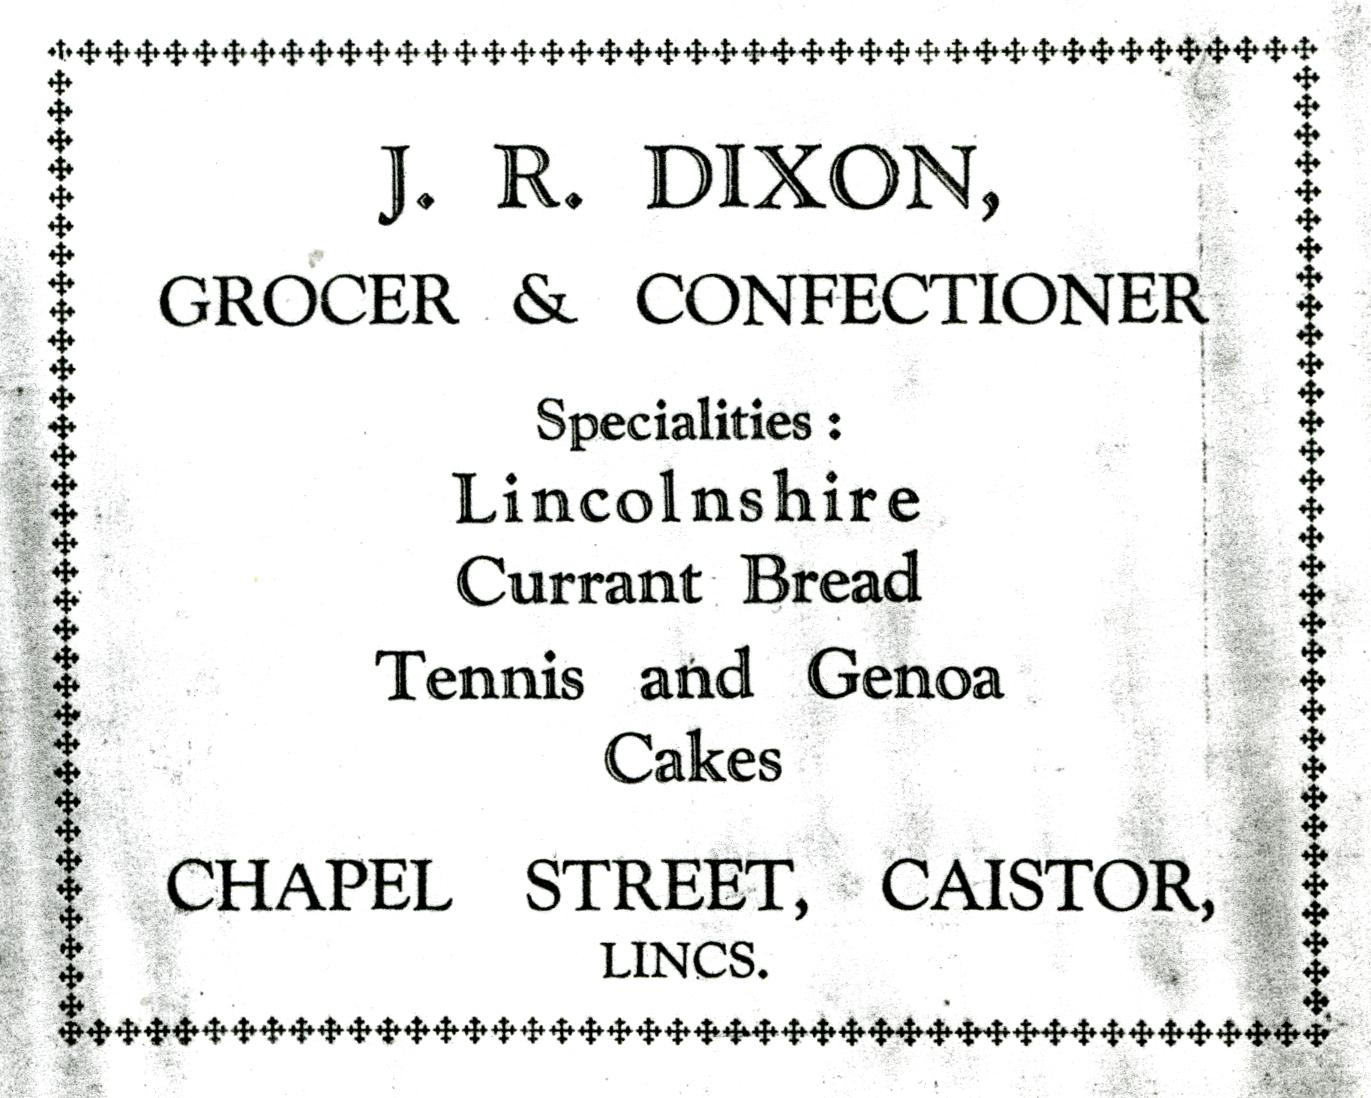 Dixon J R aft 1921.jpg